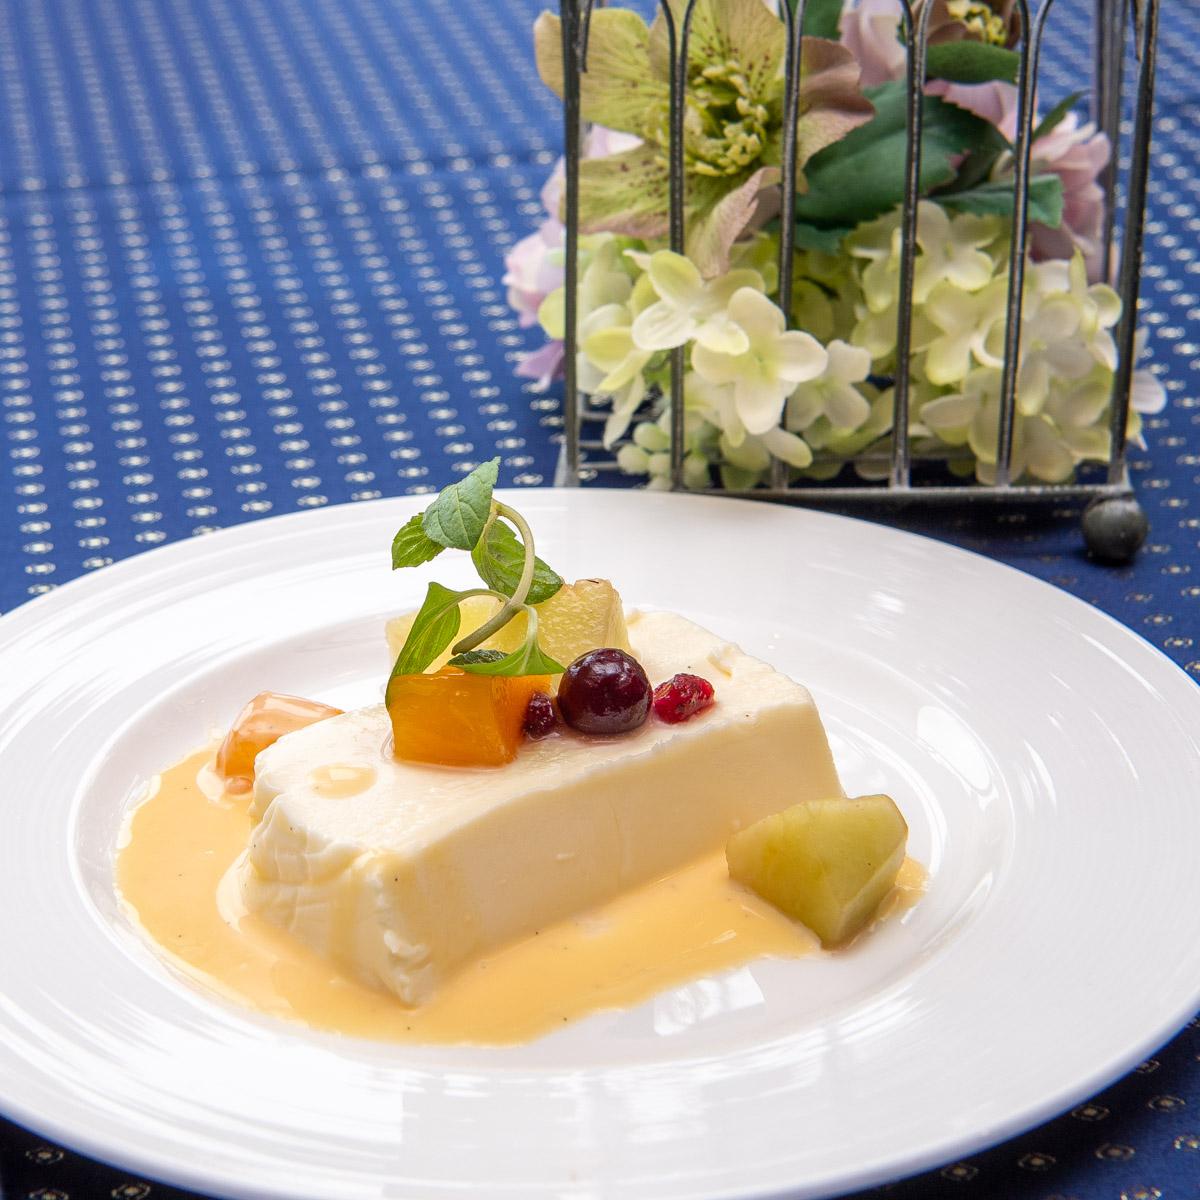 SPA & HOTEL 舞浜ユーラシア「幻のレストラン」パンナコッタ